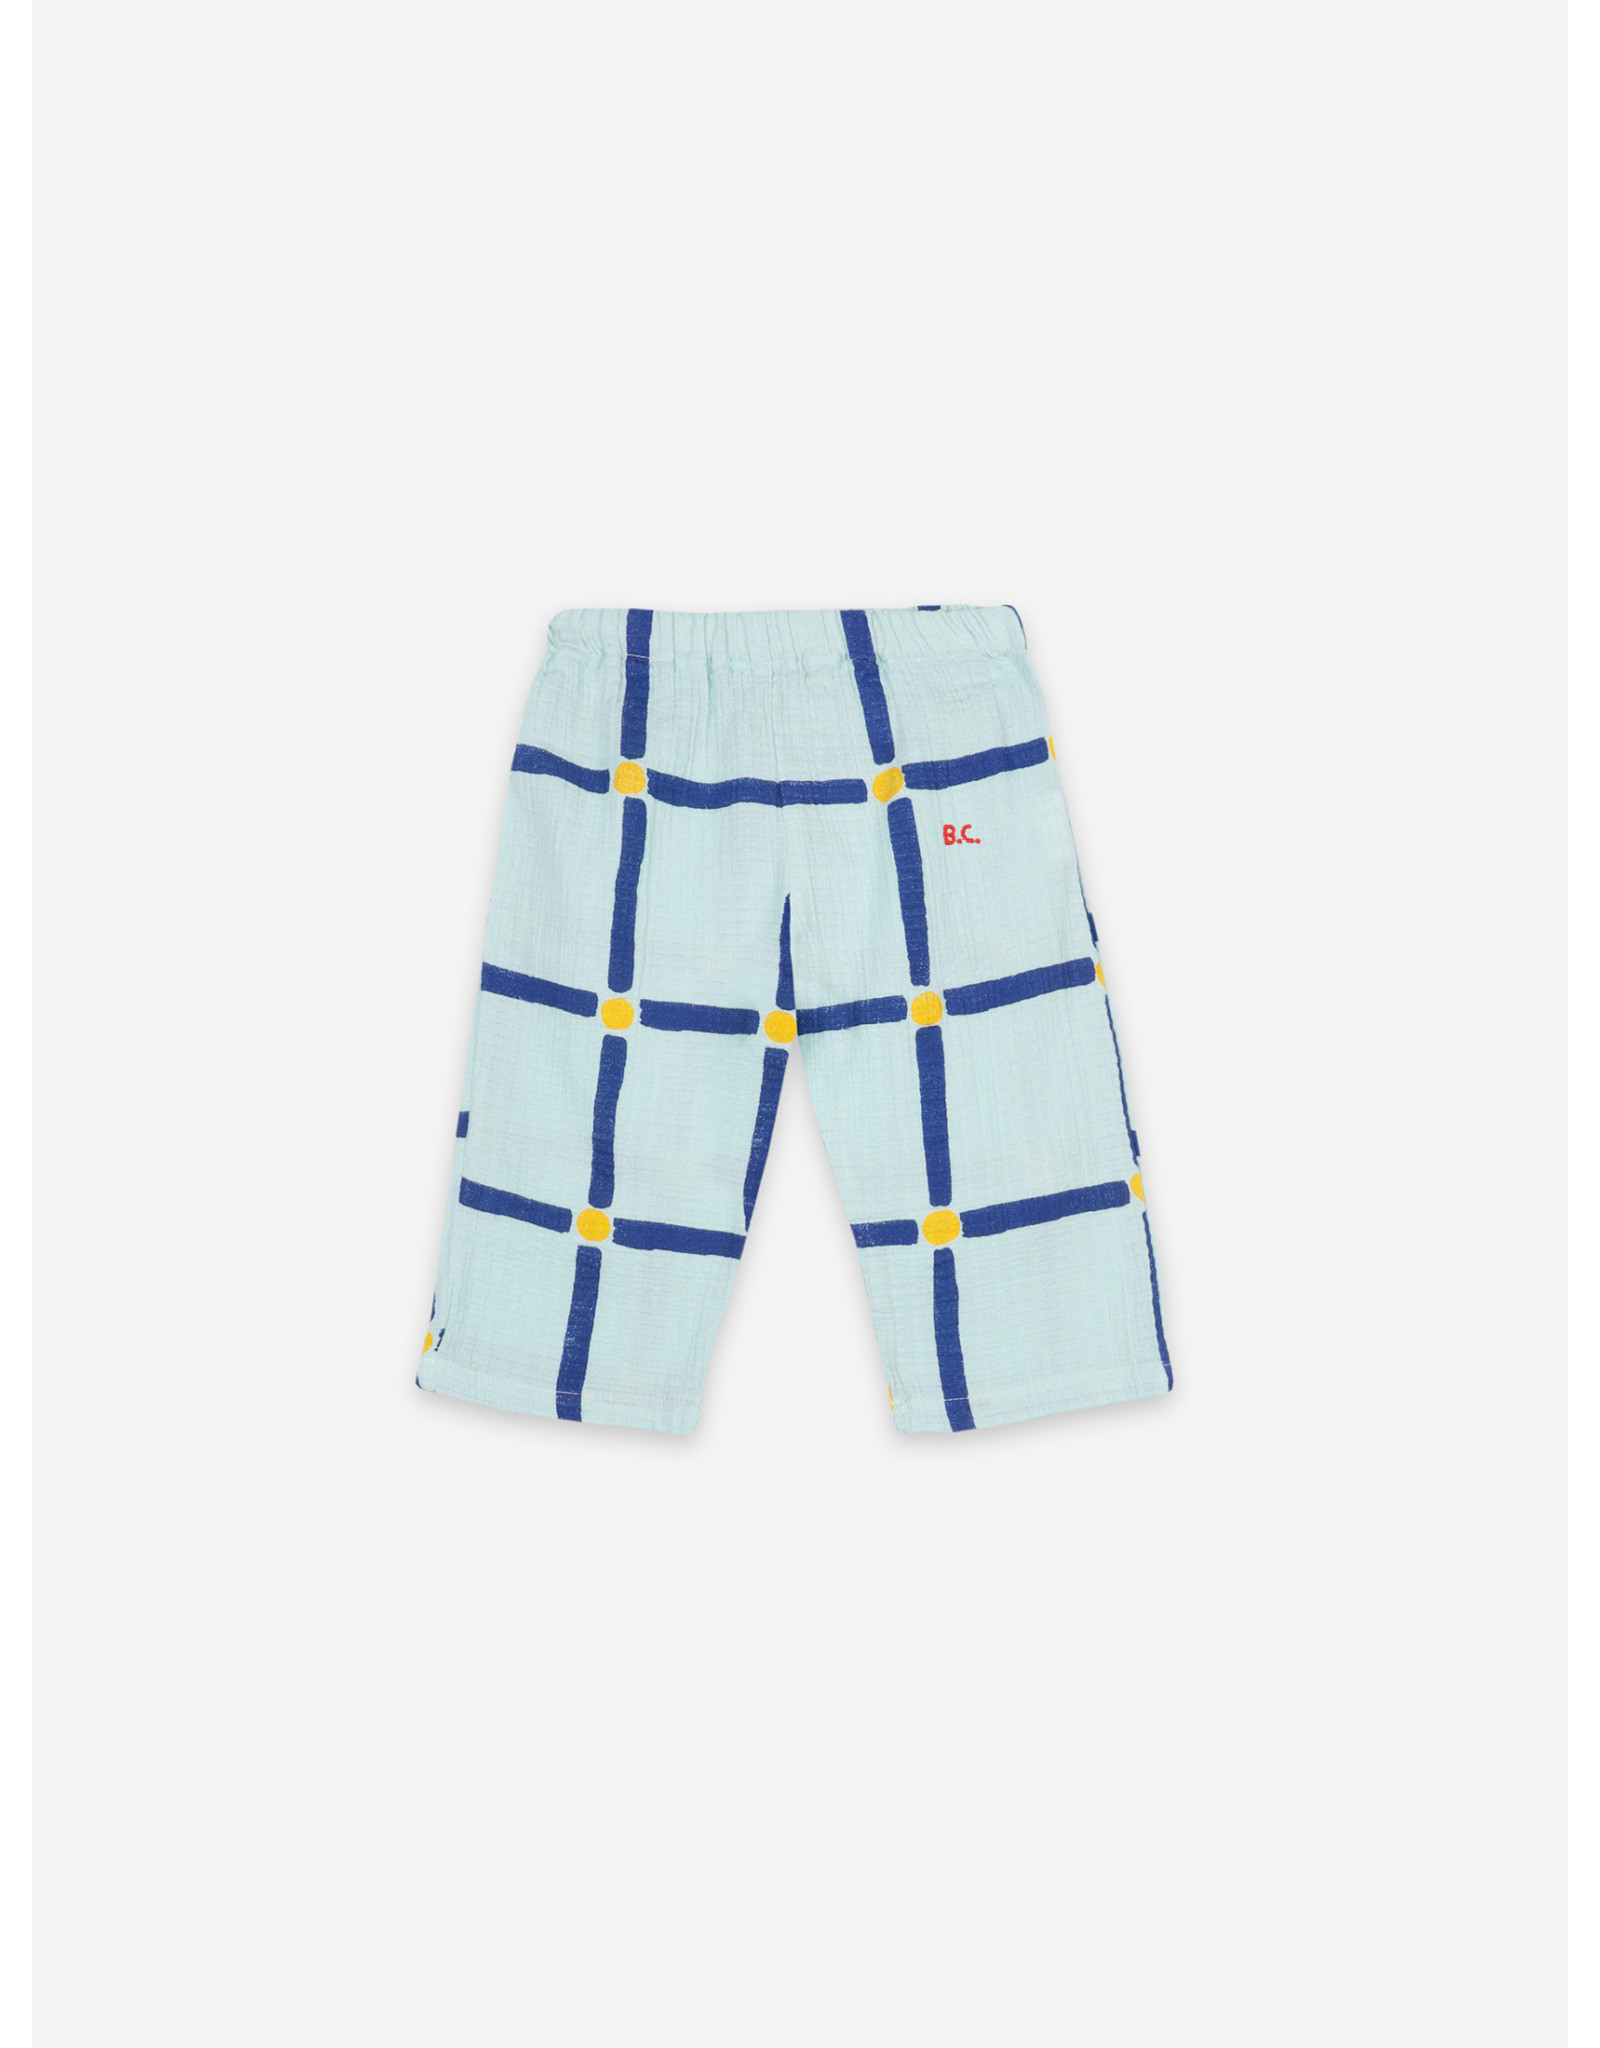 Bobo Choses Bobo Choses Cube All Over Woven Trousers